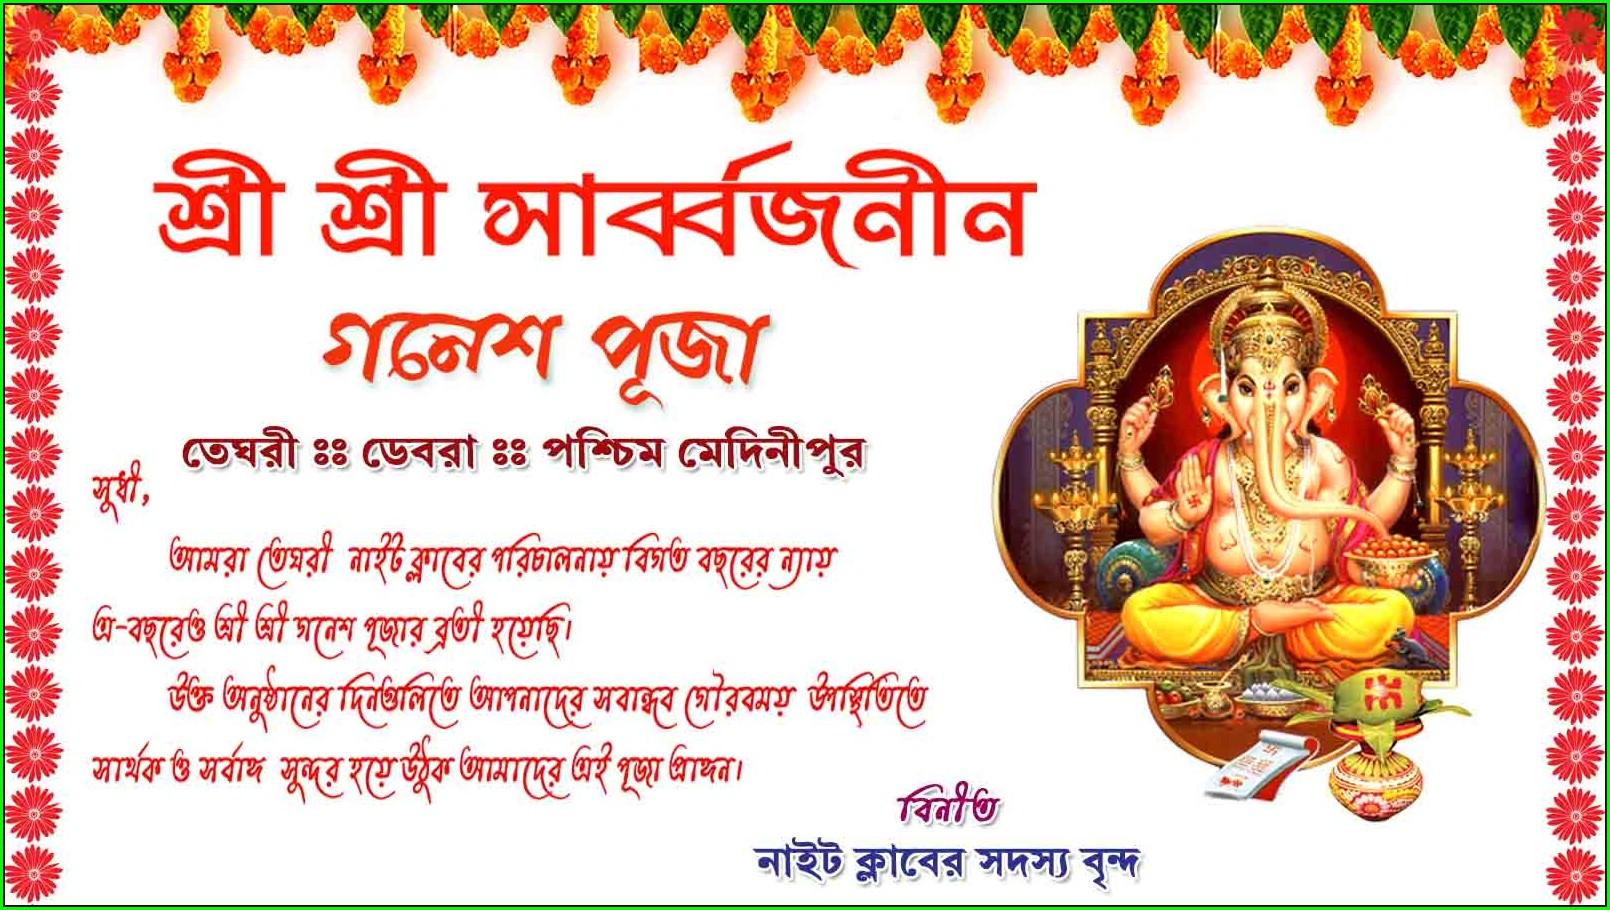 Ganesh Puja Invitation Card In Bengali